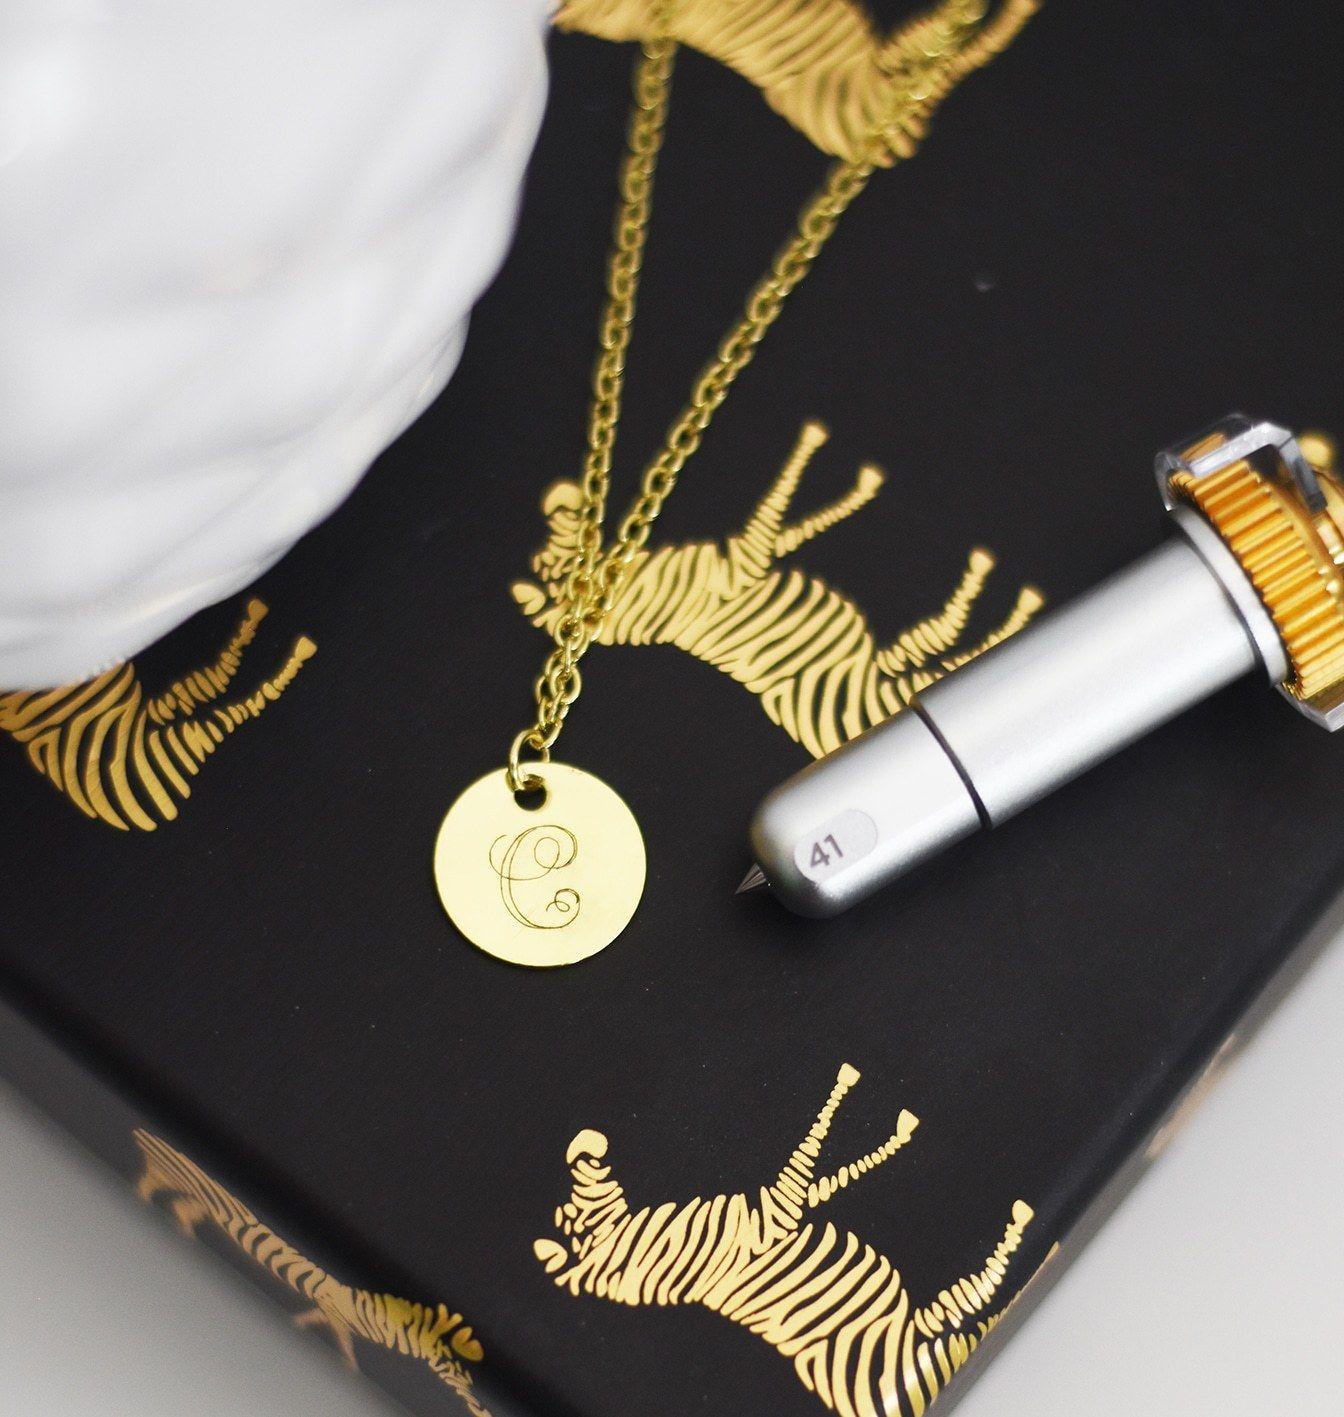 Cricut engraving tool monogram necklace tutorial